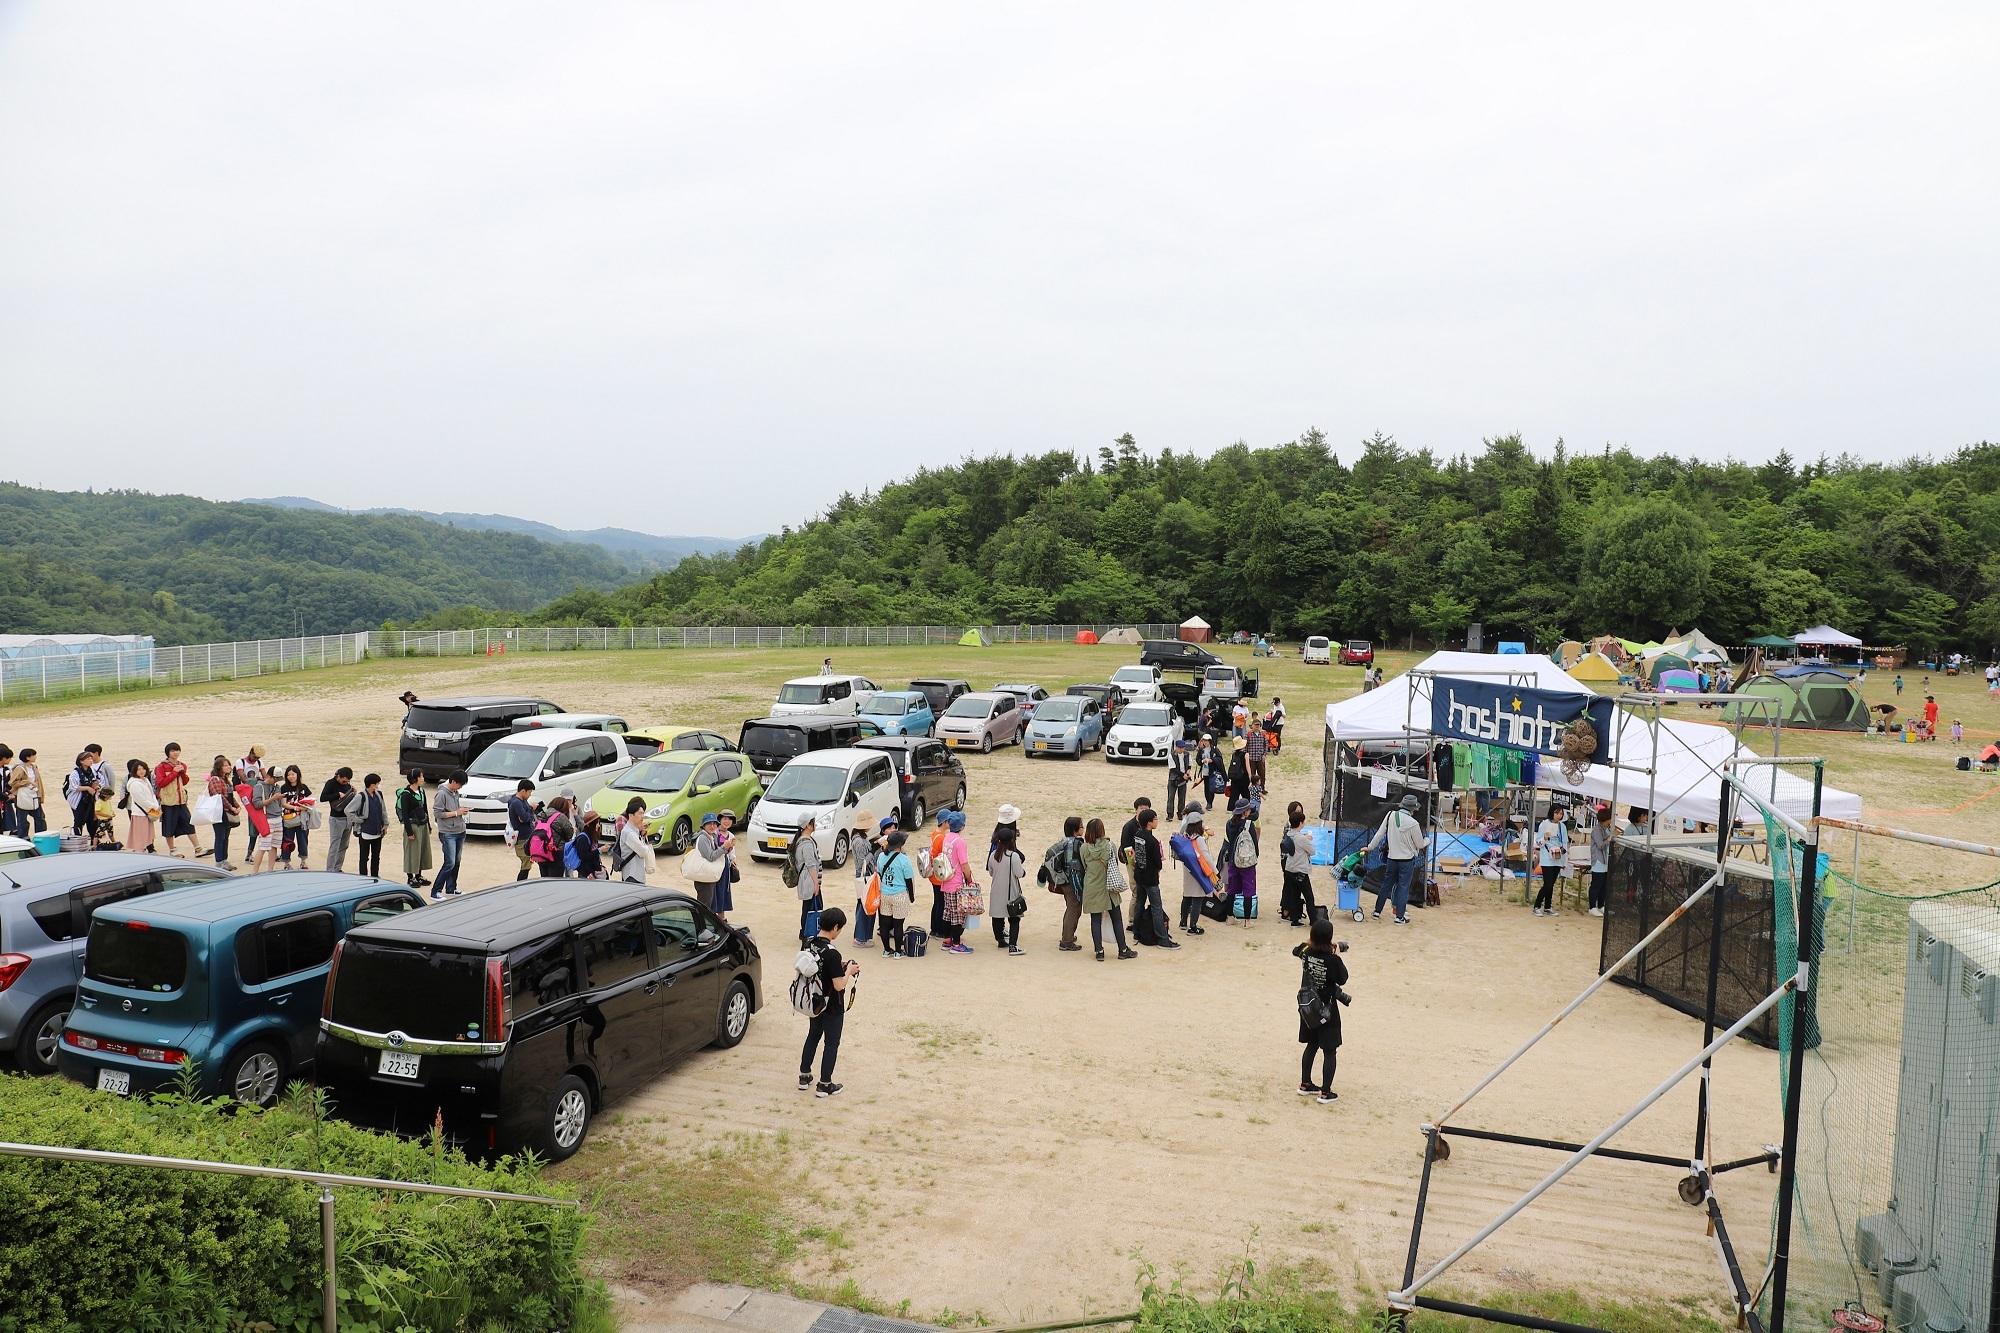 <『re:hoshioto 20-21』場内駐車場券付き限定入場リストバンド プラン>